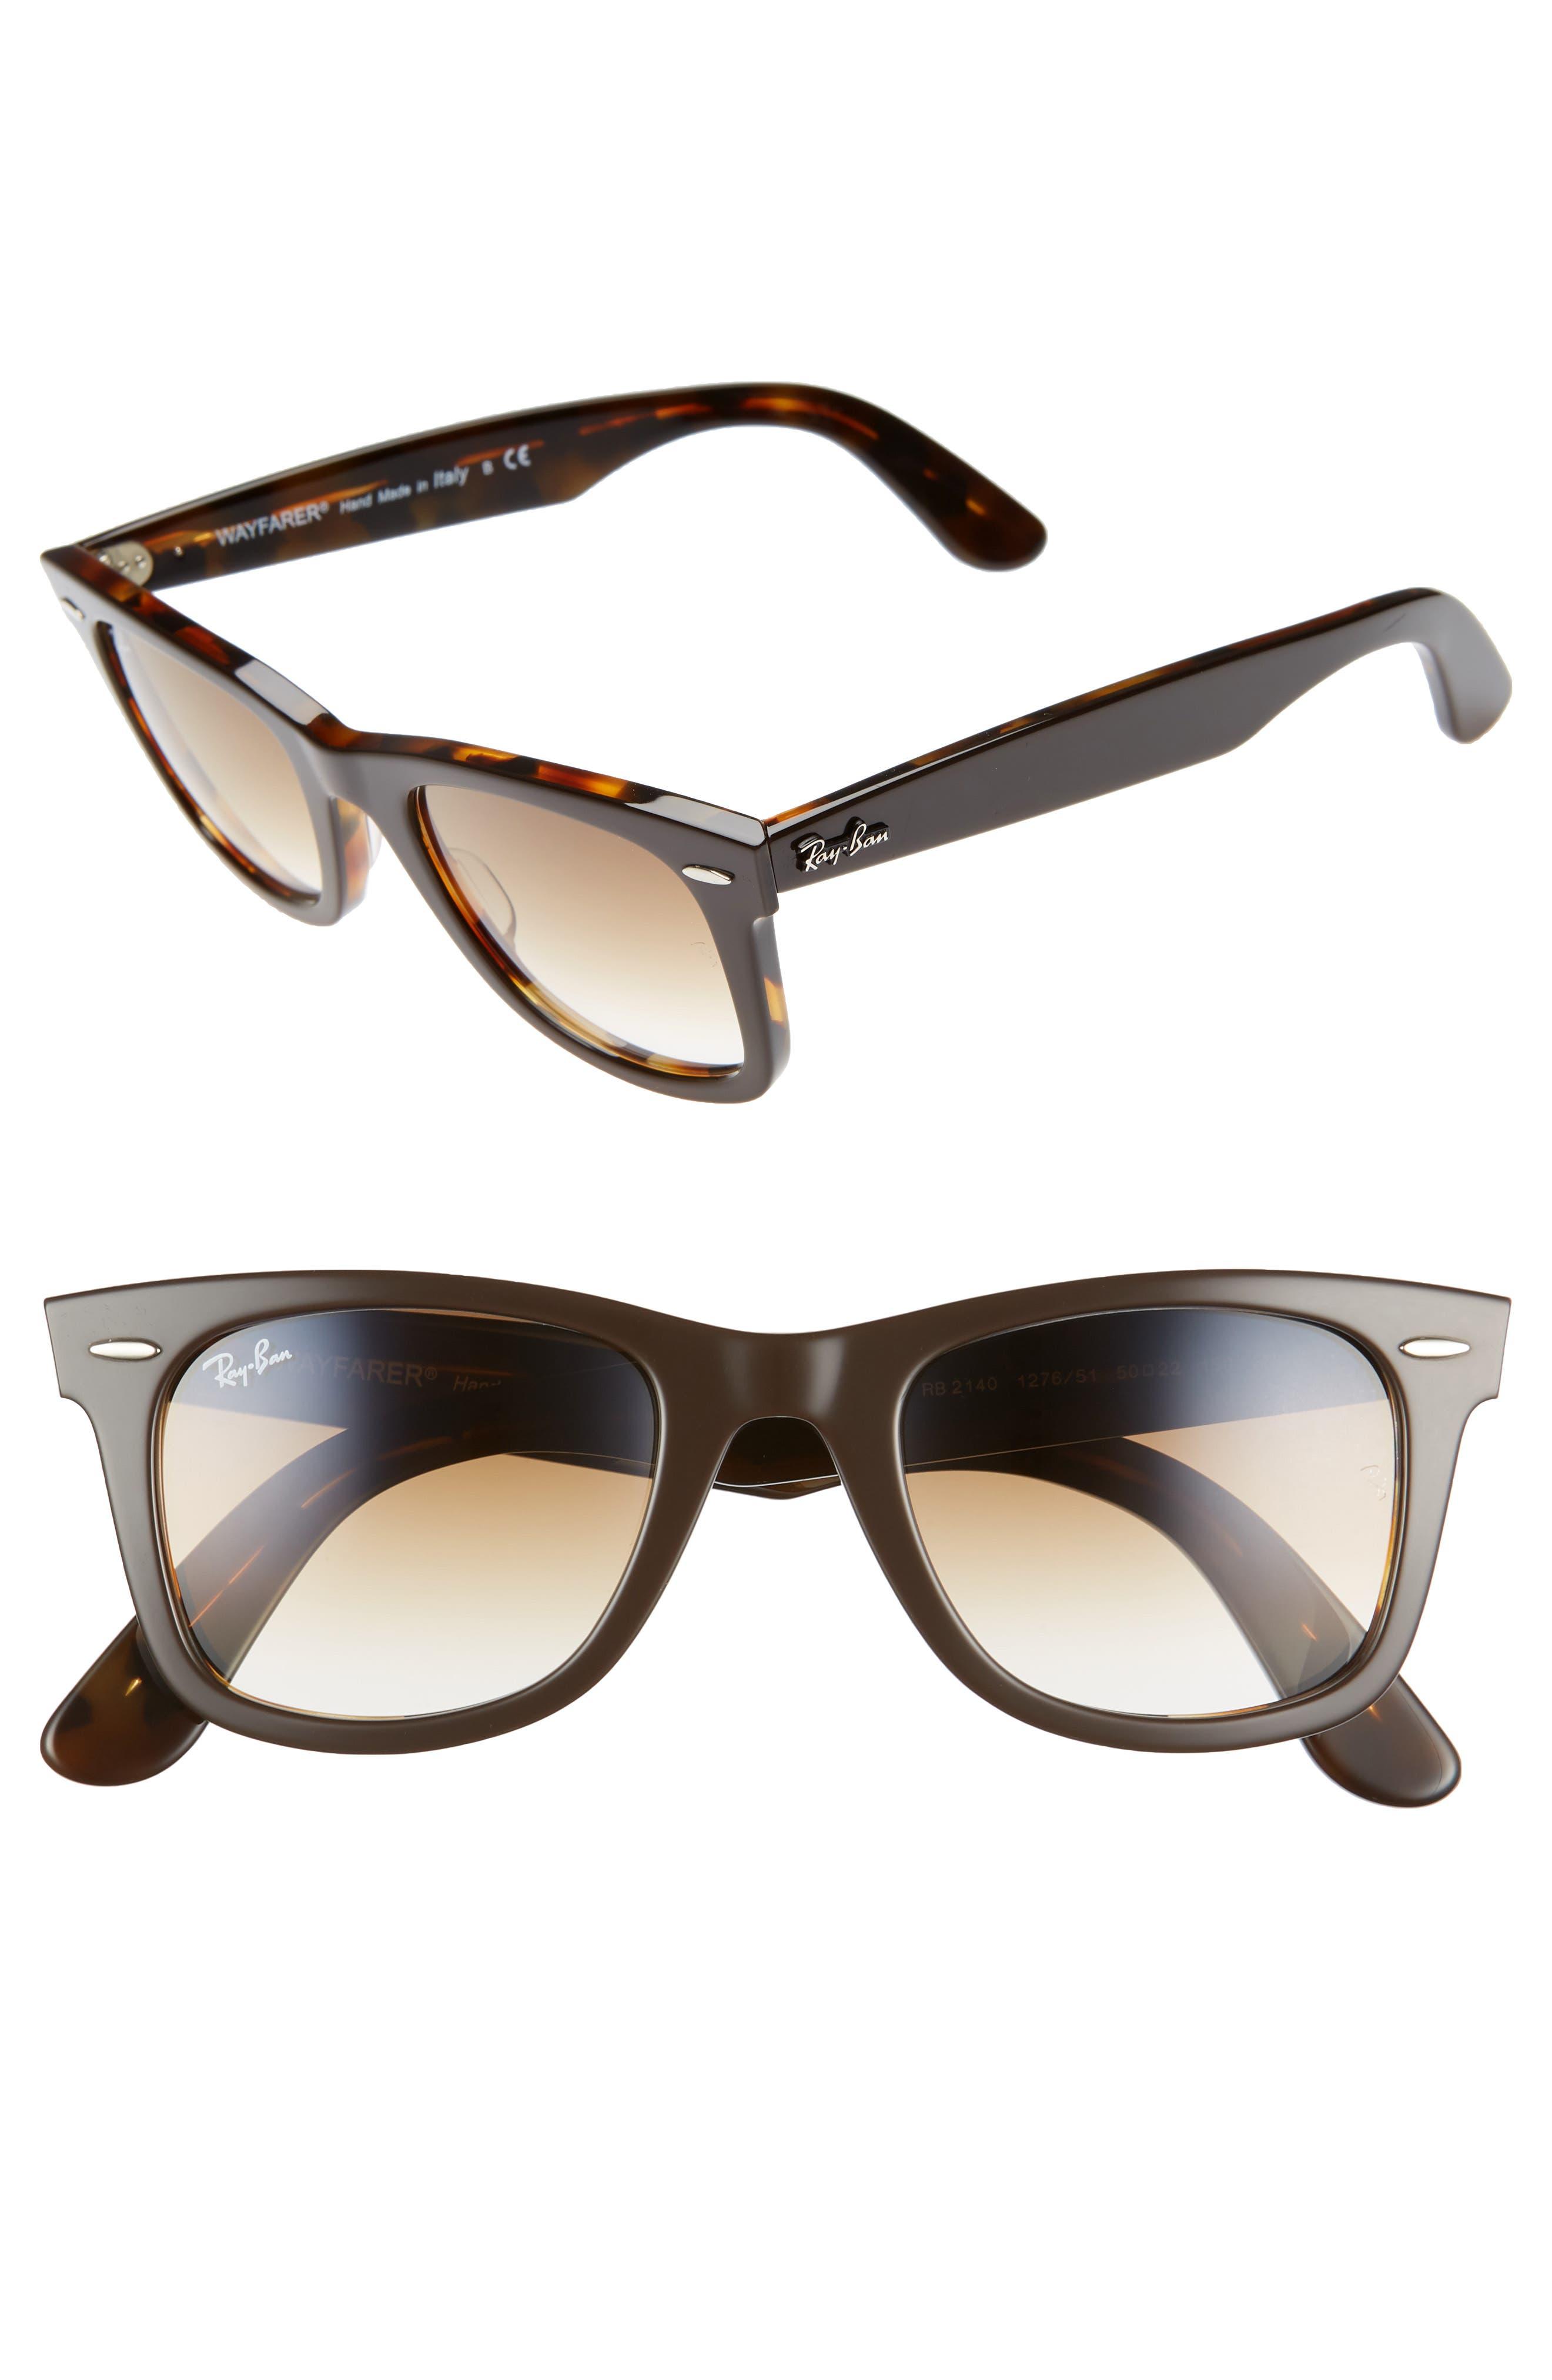 RAY-BAN, 'Classic Wayfarer' 50mm Sunglasses, Main thumbnail 1, color, BROWN/ YELLOW GRADIENT